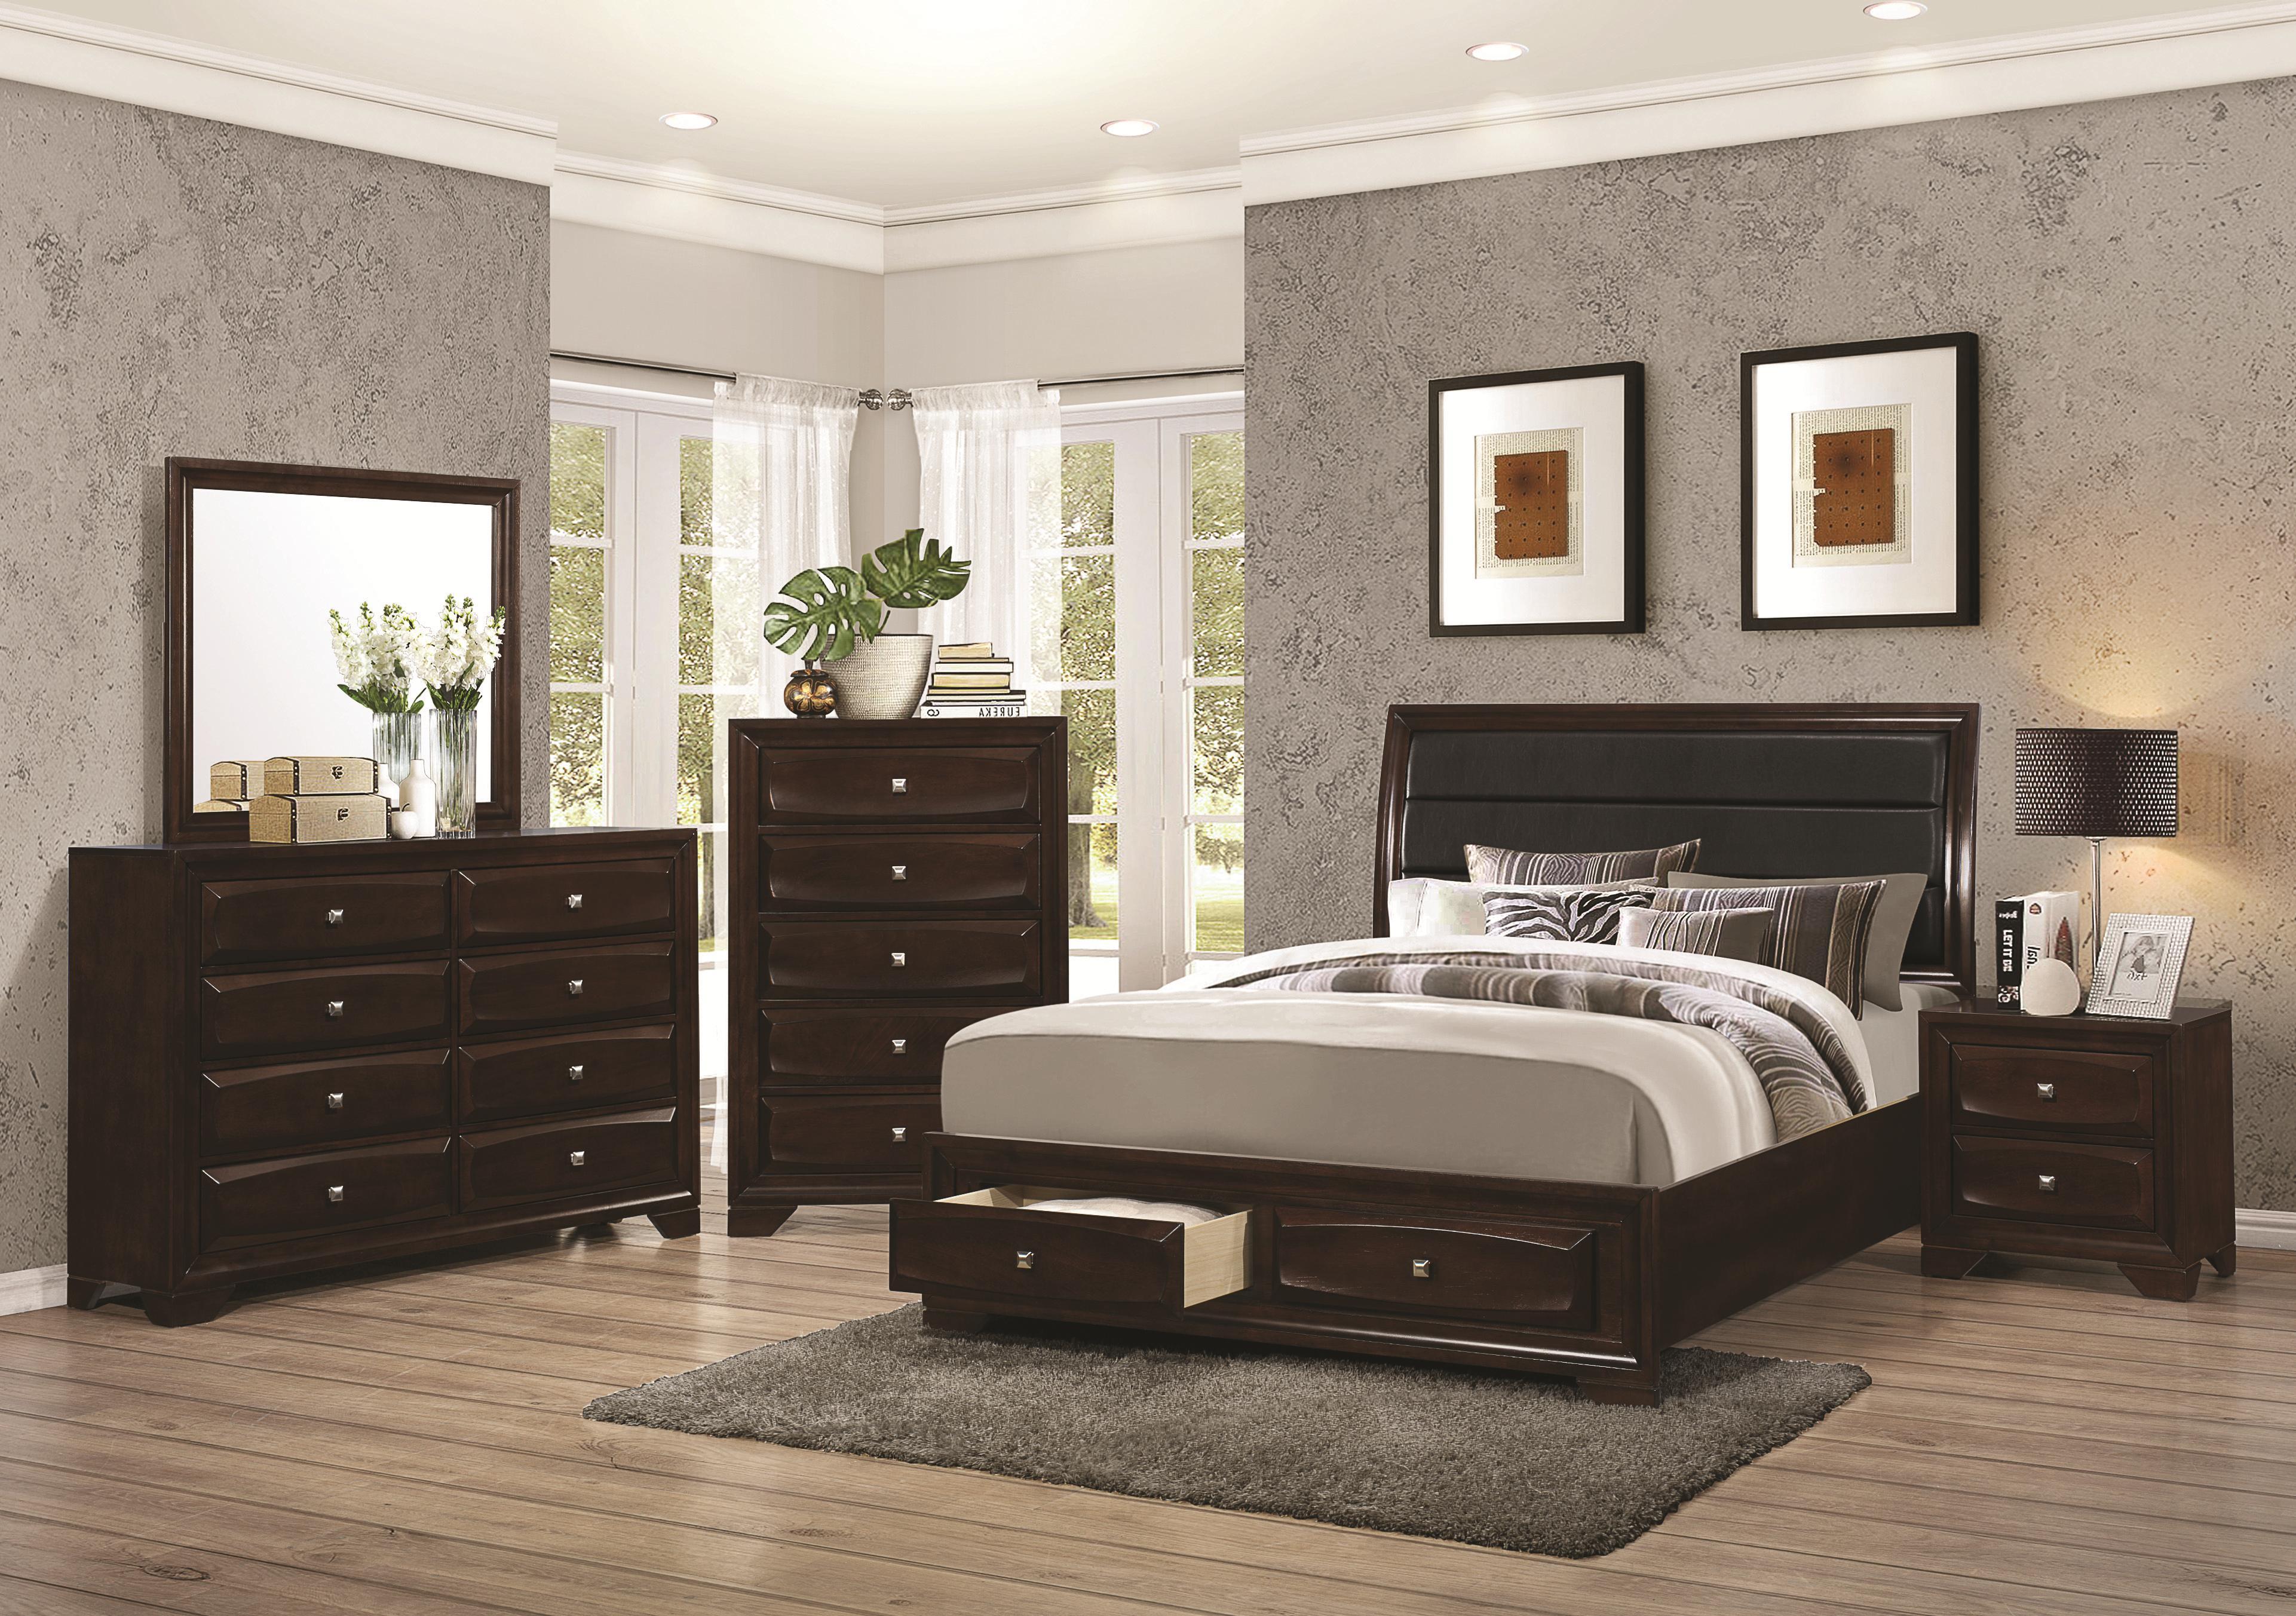 Coaster Jaxson 203481kw California King Bed With